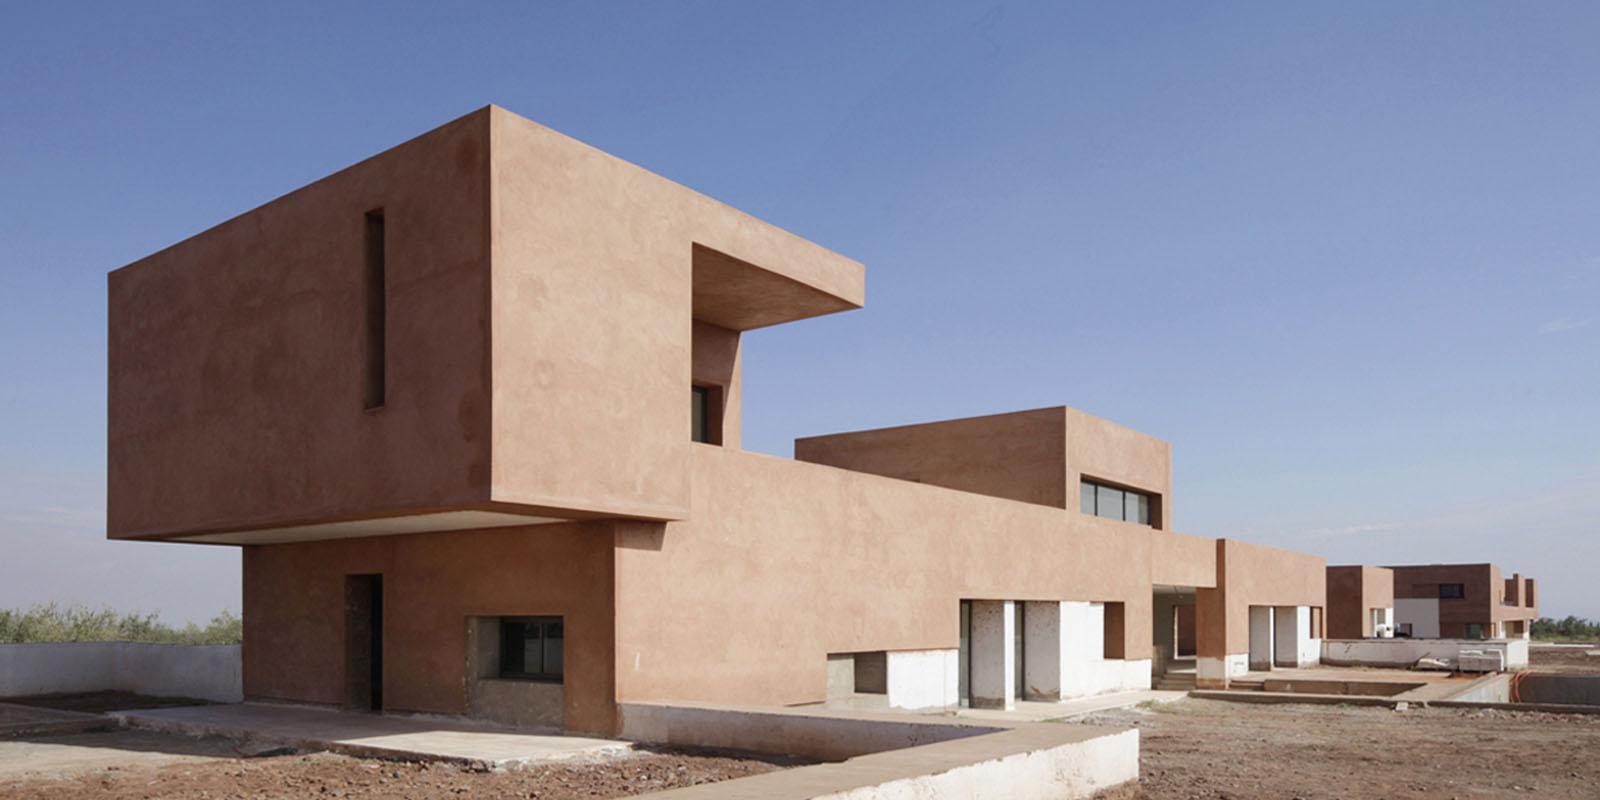 co-habitation-kilo-architectures-luc-boegly-08